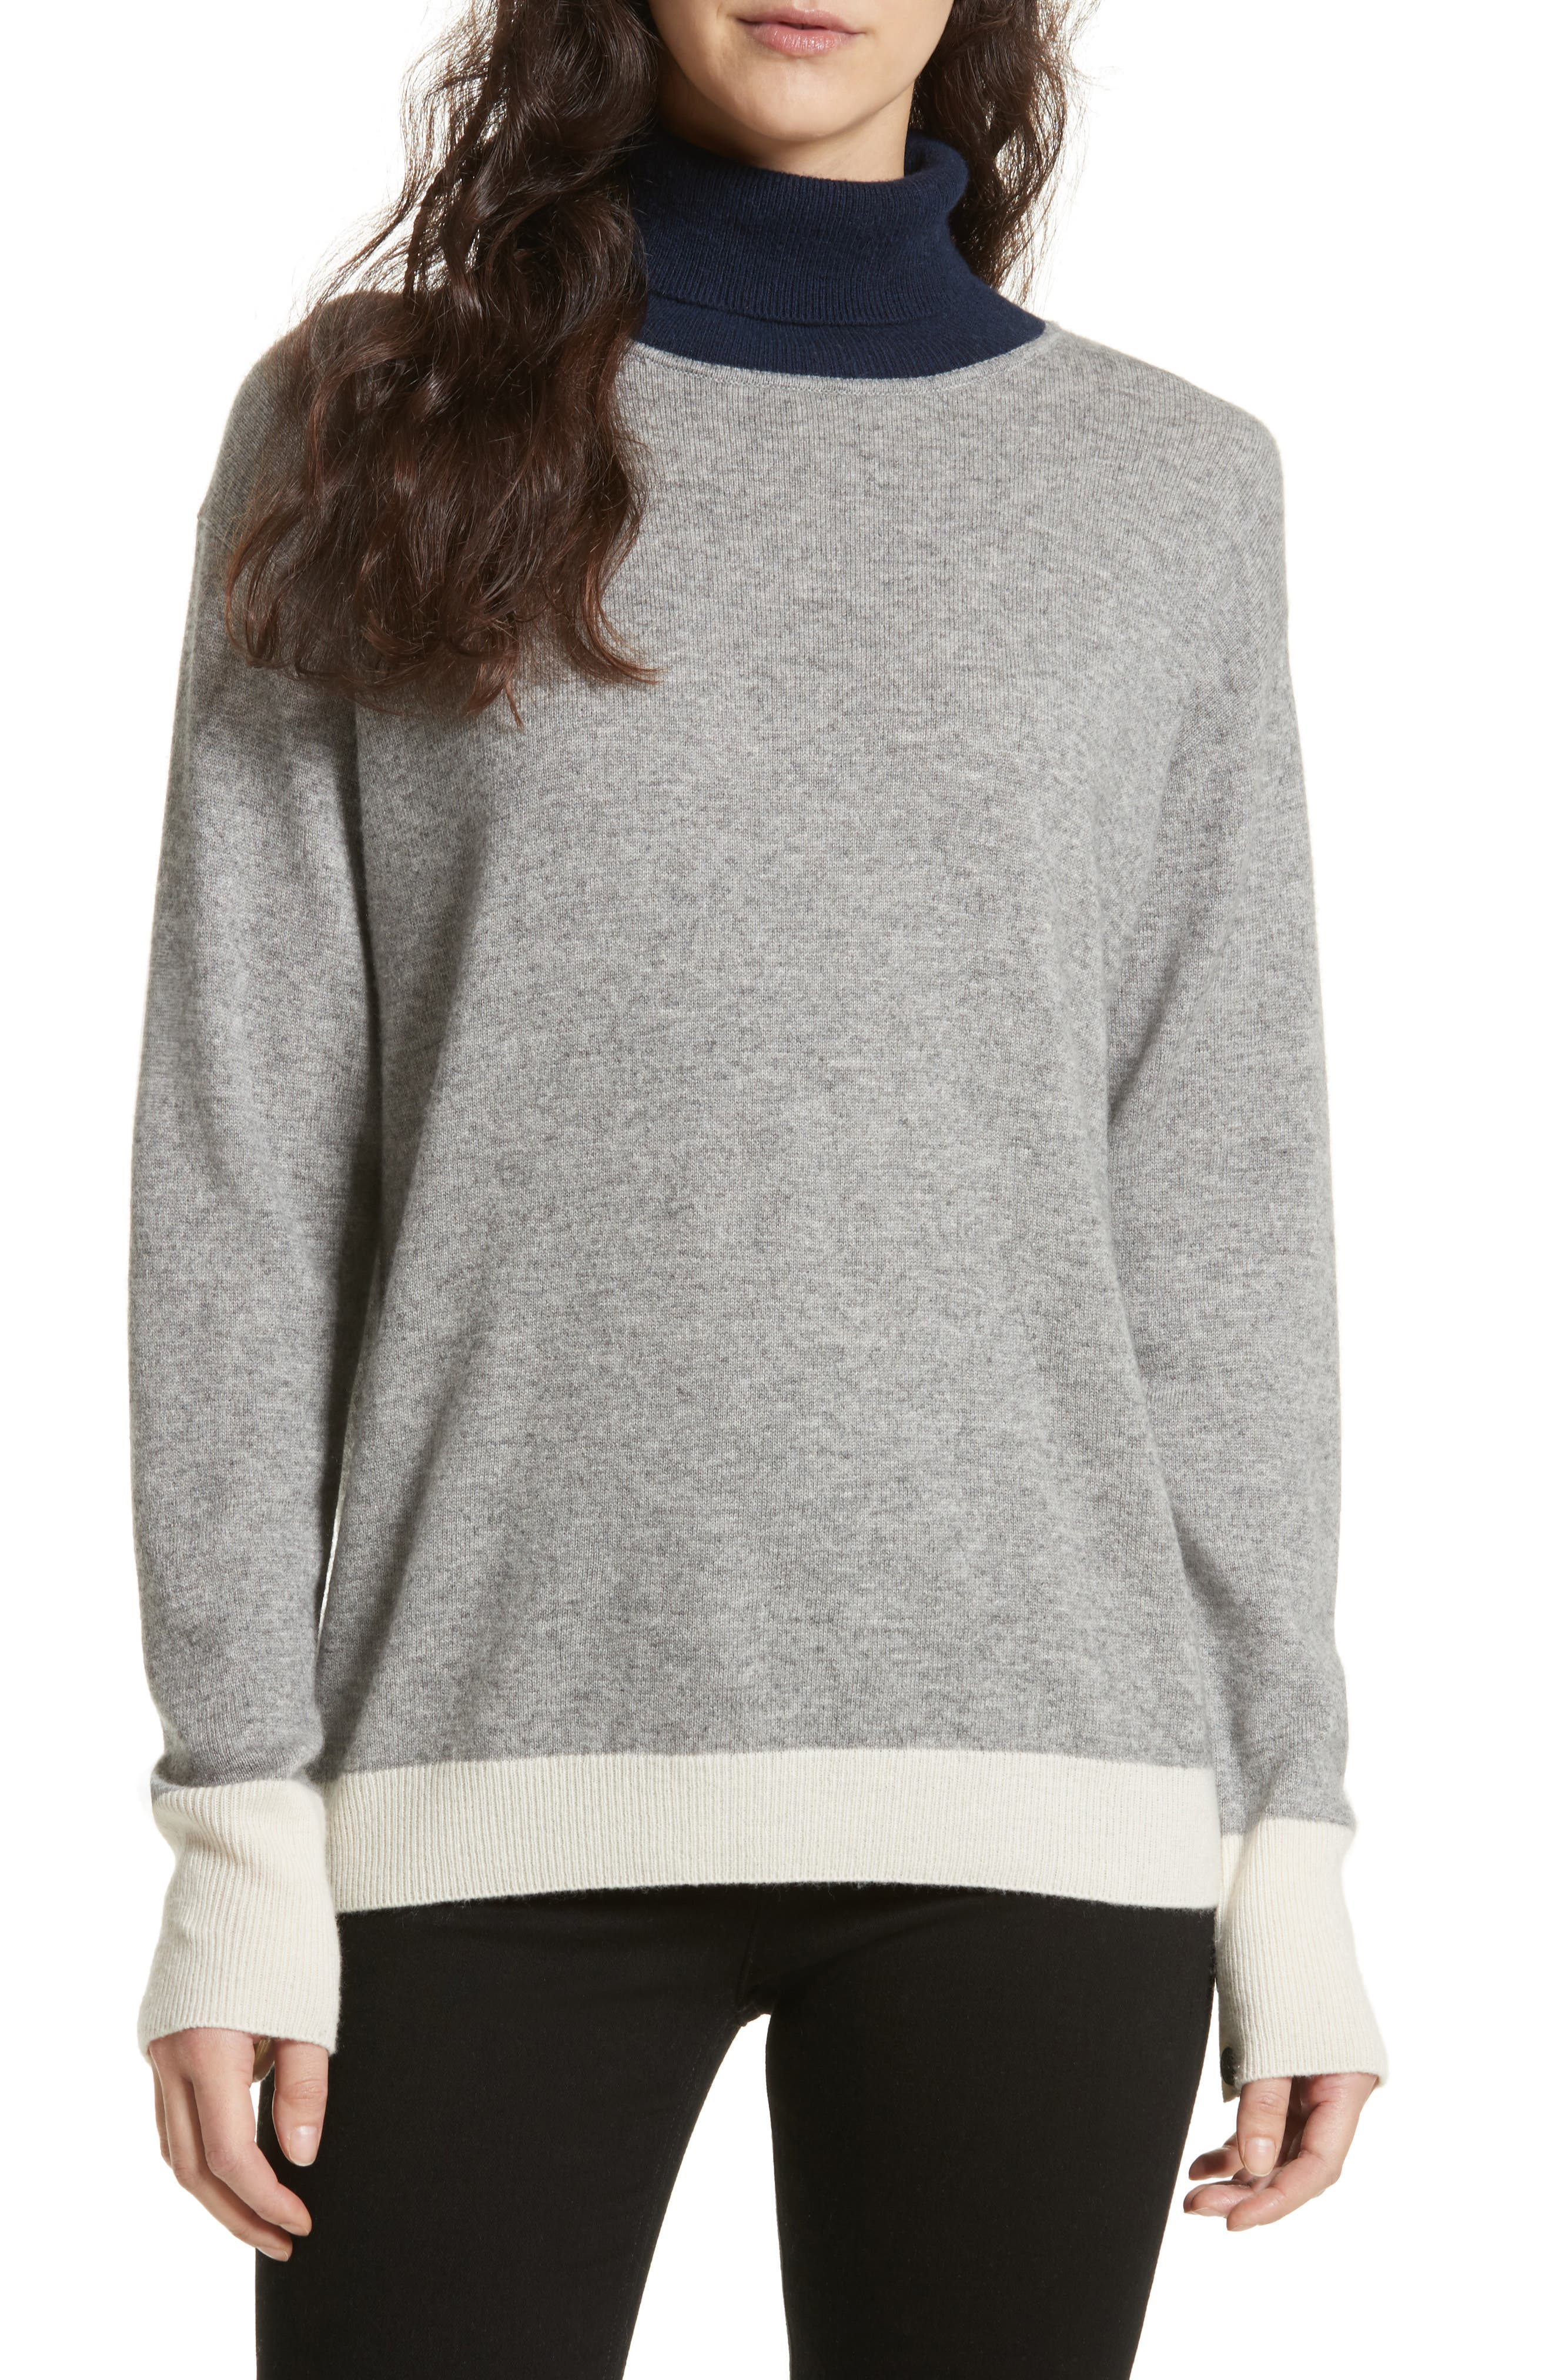 Rhea Wool & Cashmere Turtleneck Sweater,                         Main,                         color, Grey Heather